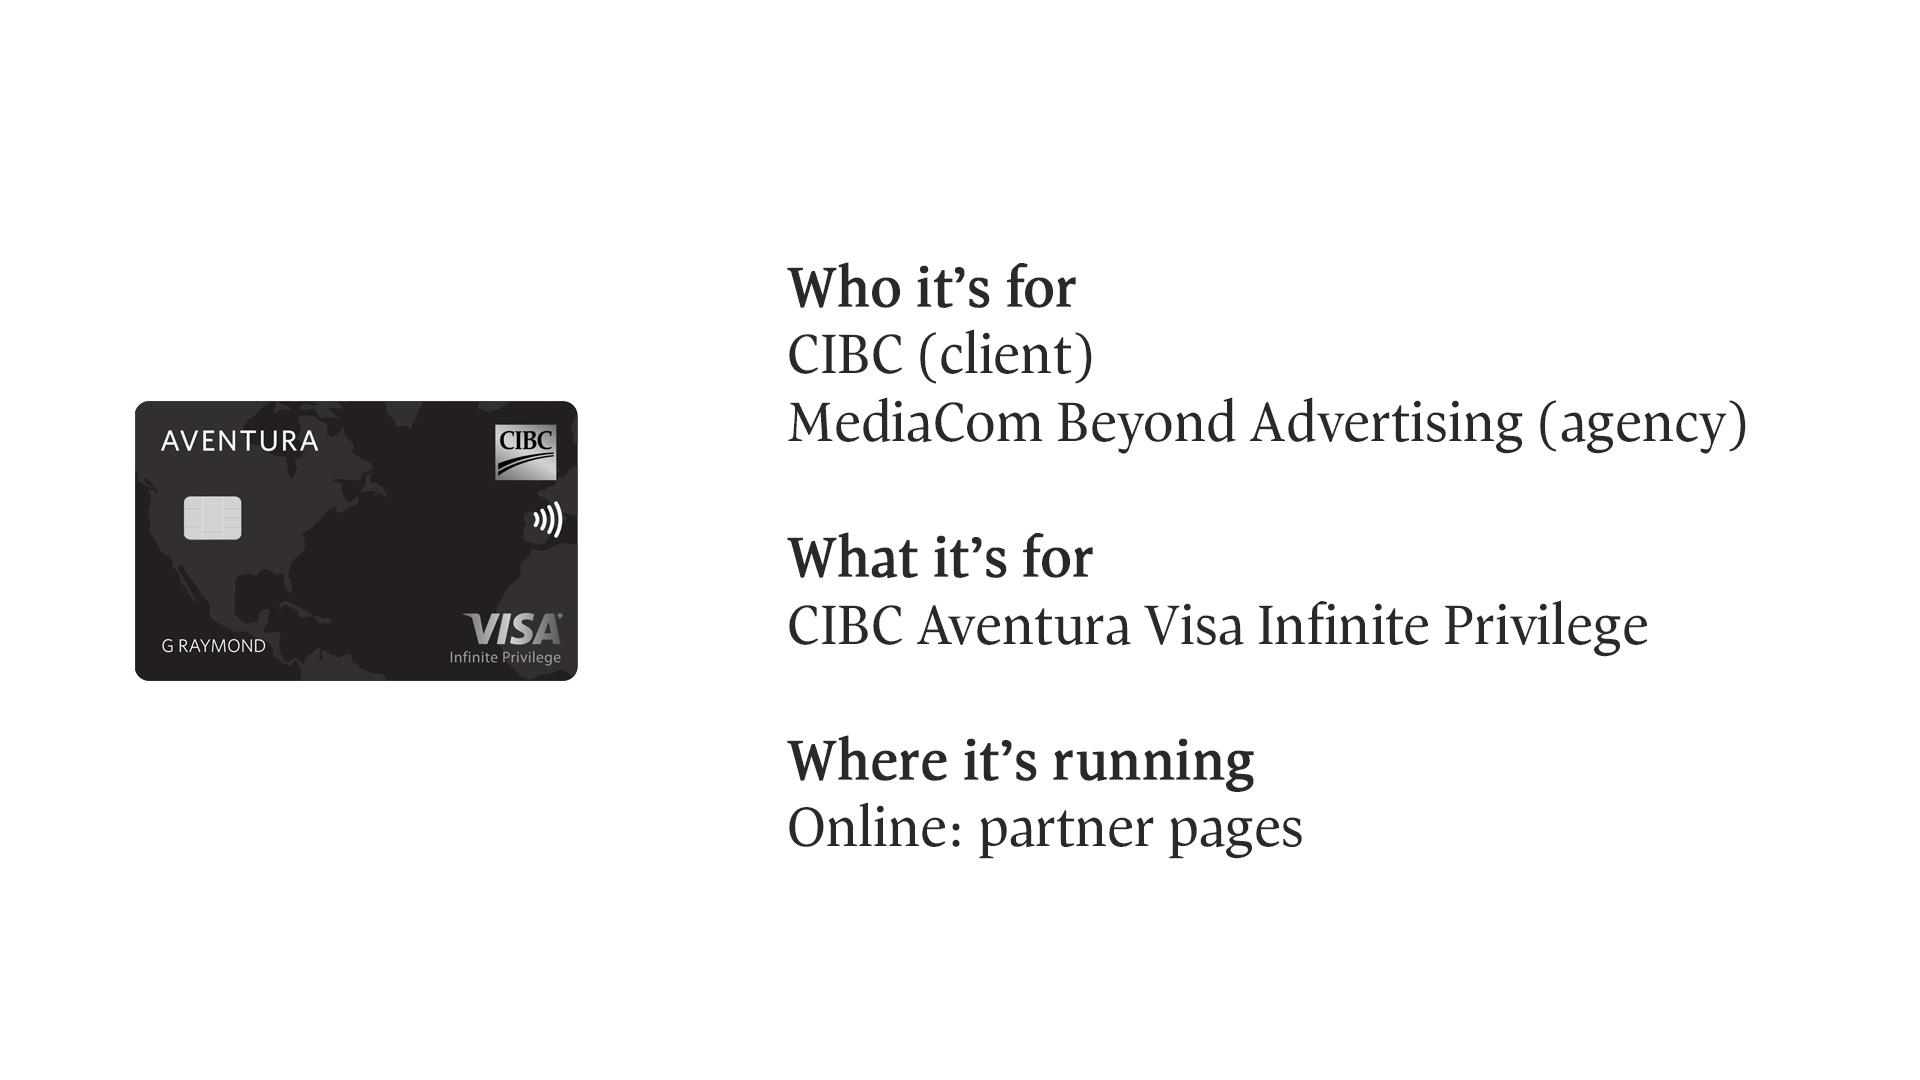 CIBC-Aventura-info-screen-1920x1080